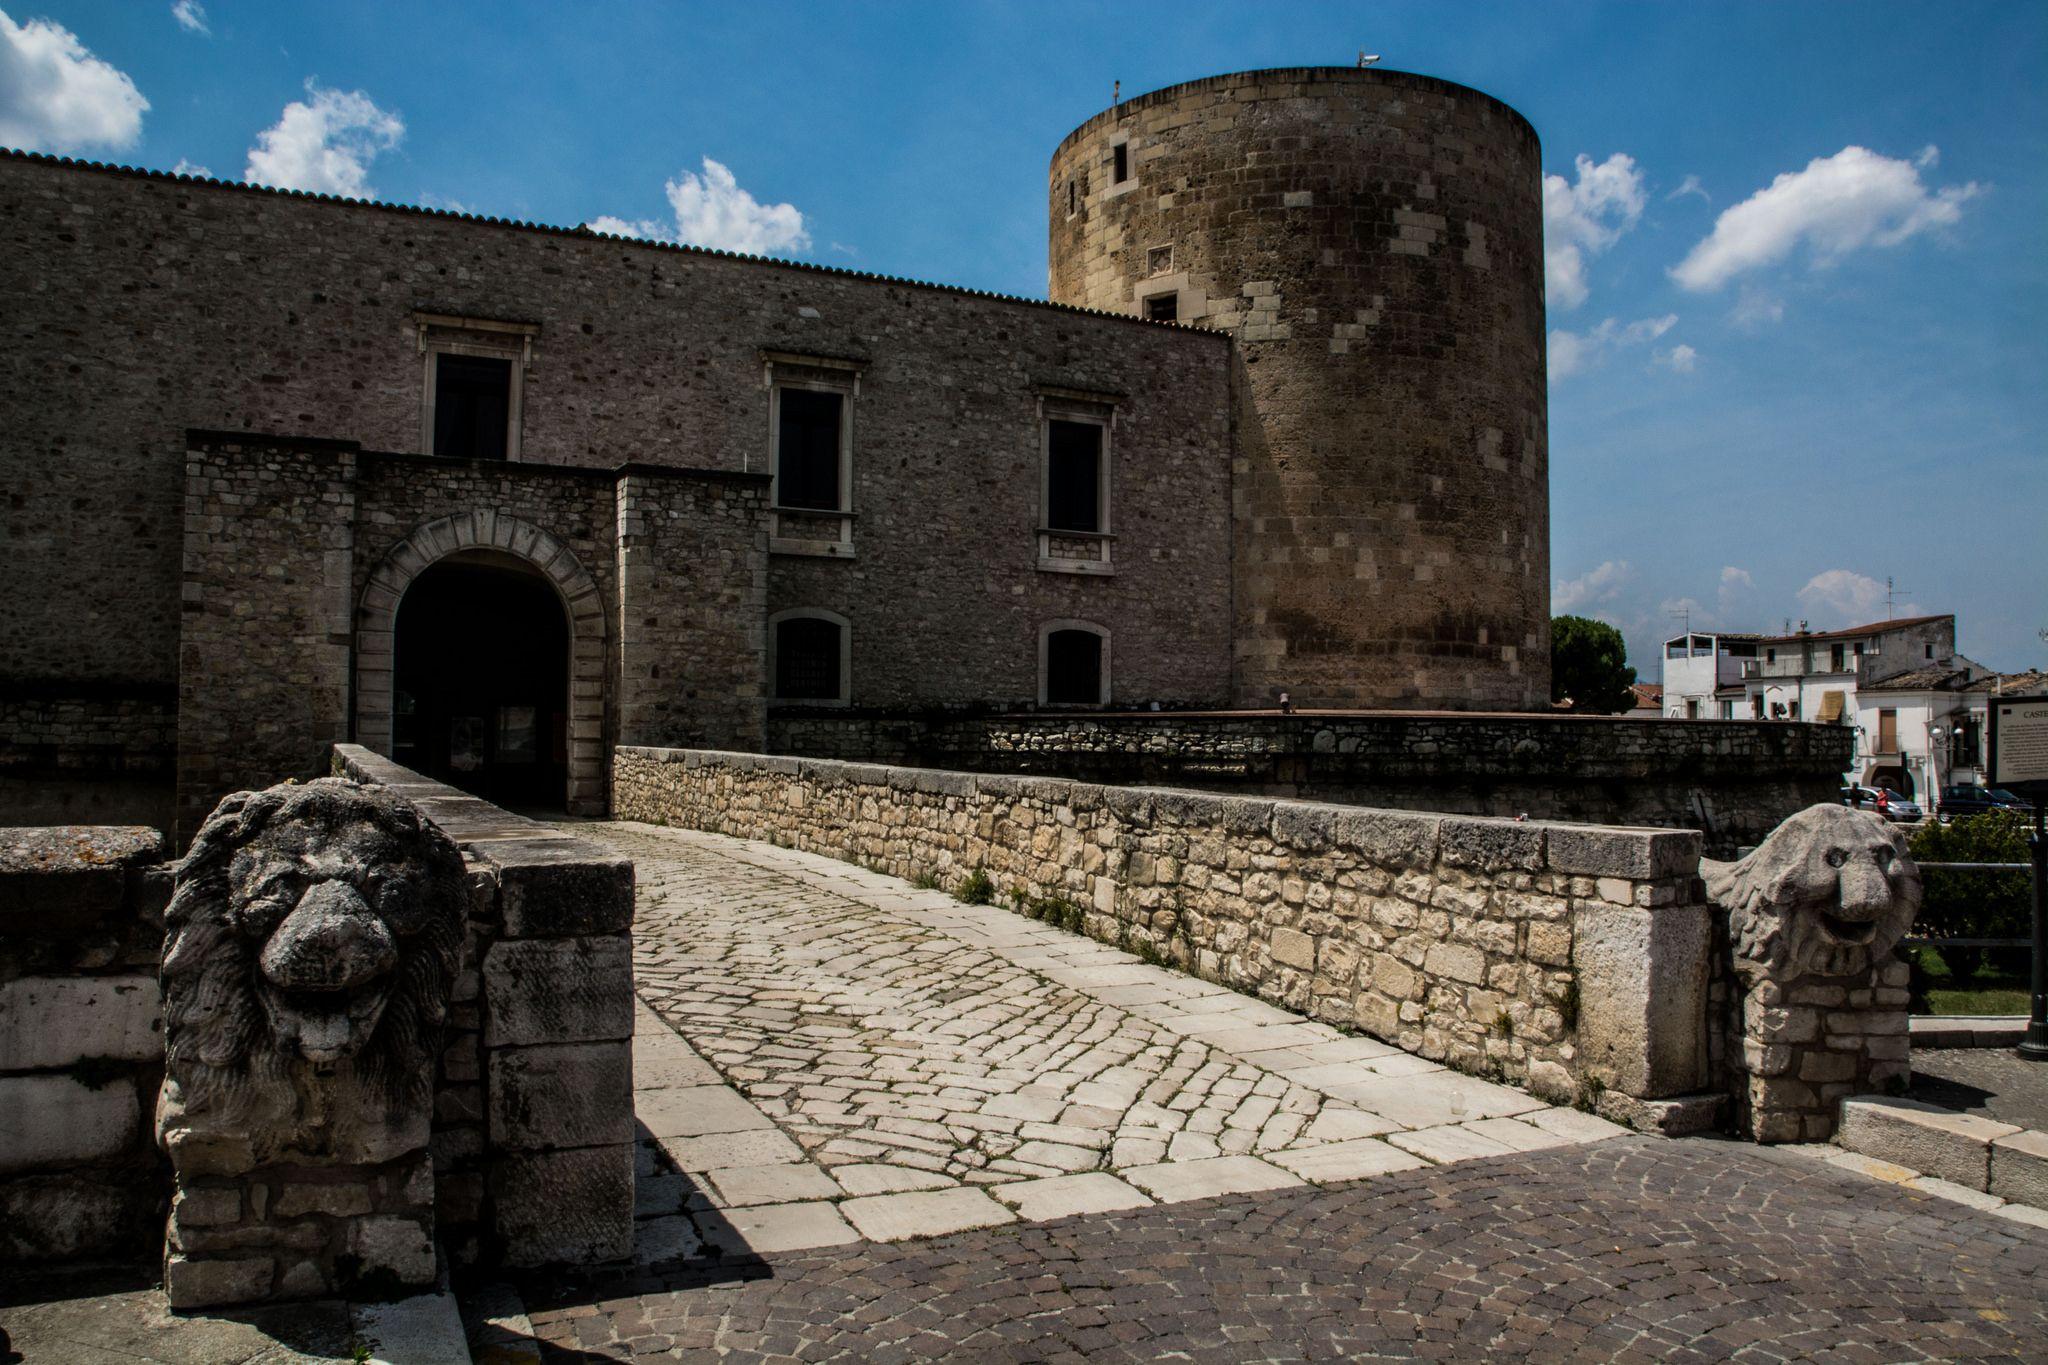 Castello Aragonese, Venosa, Basilicata, Italy